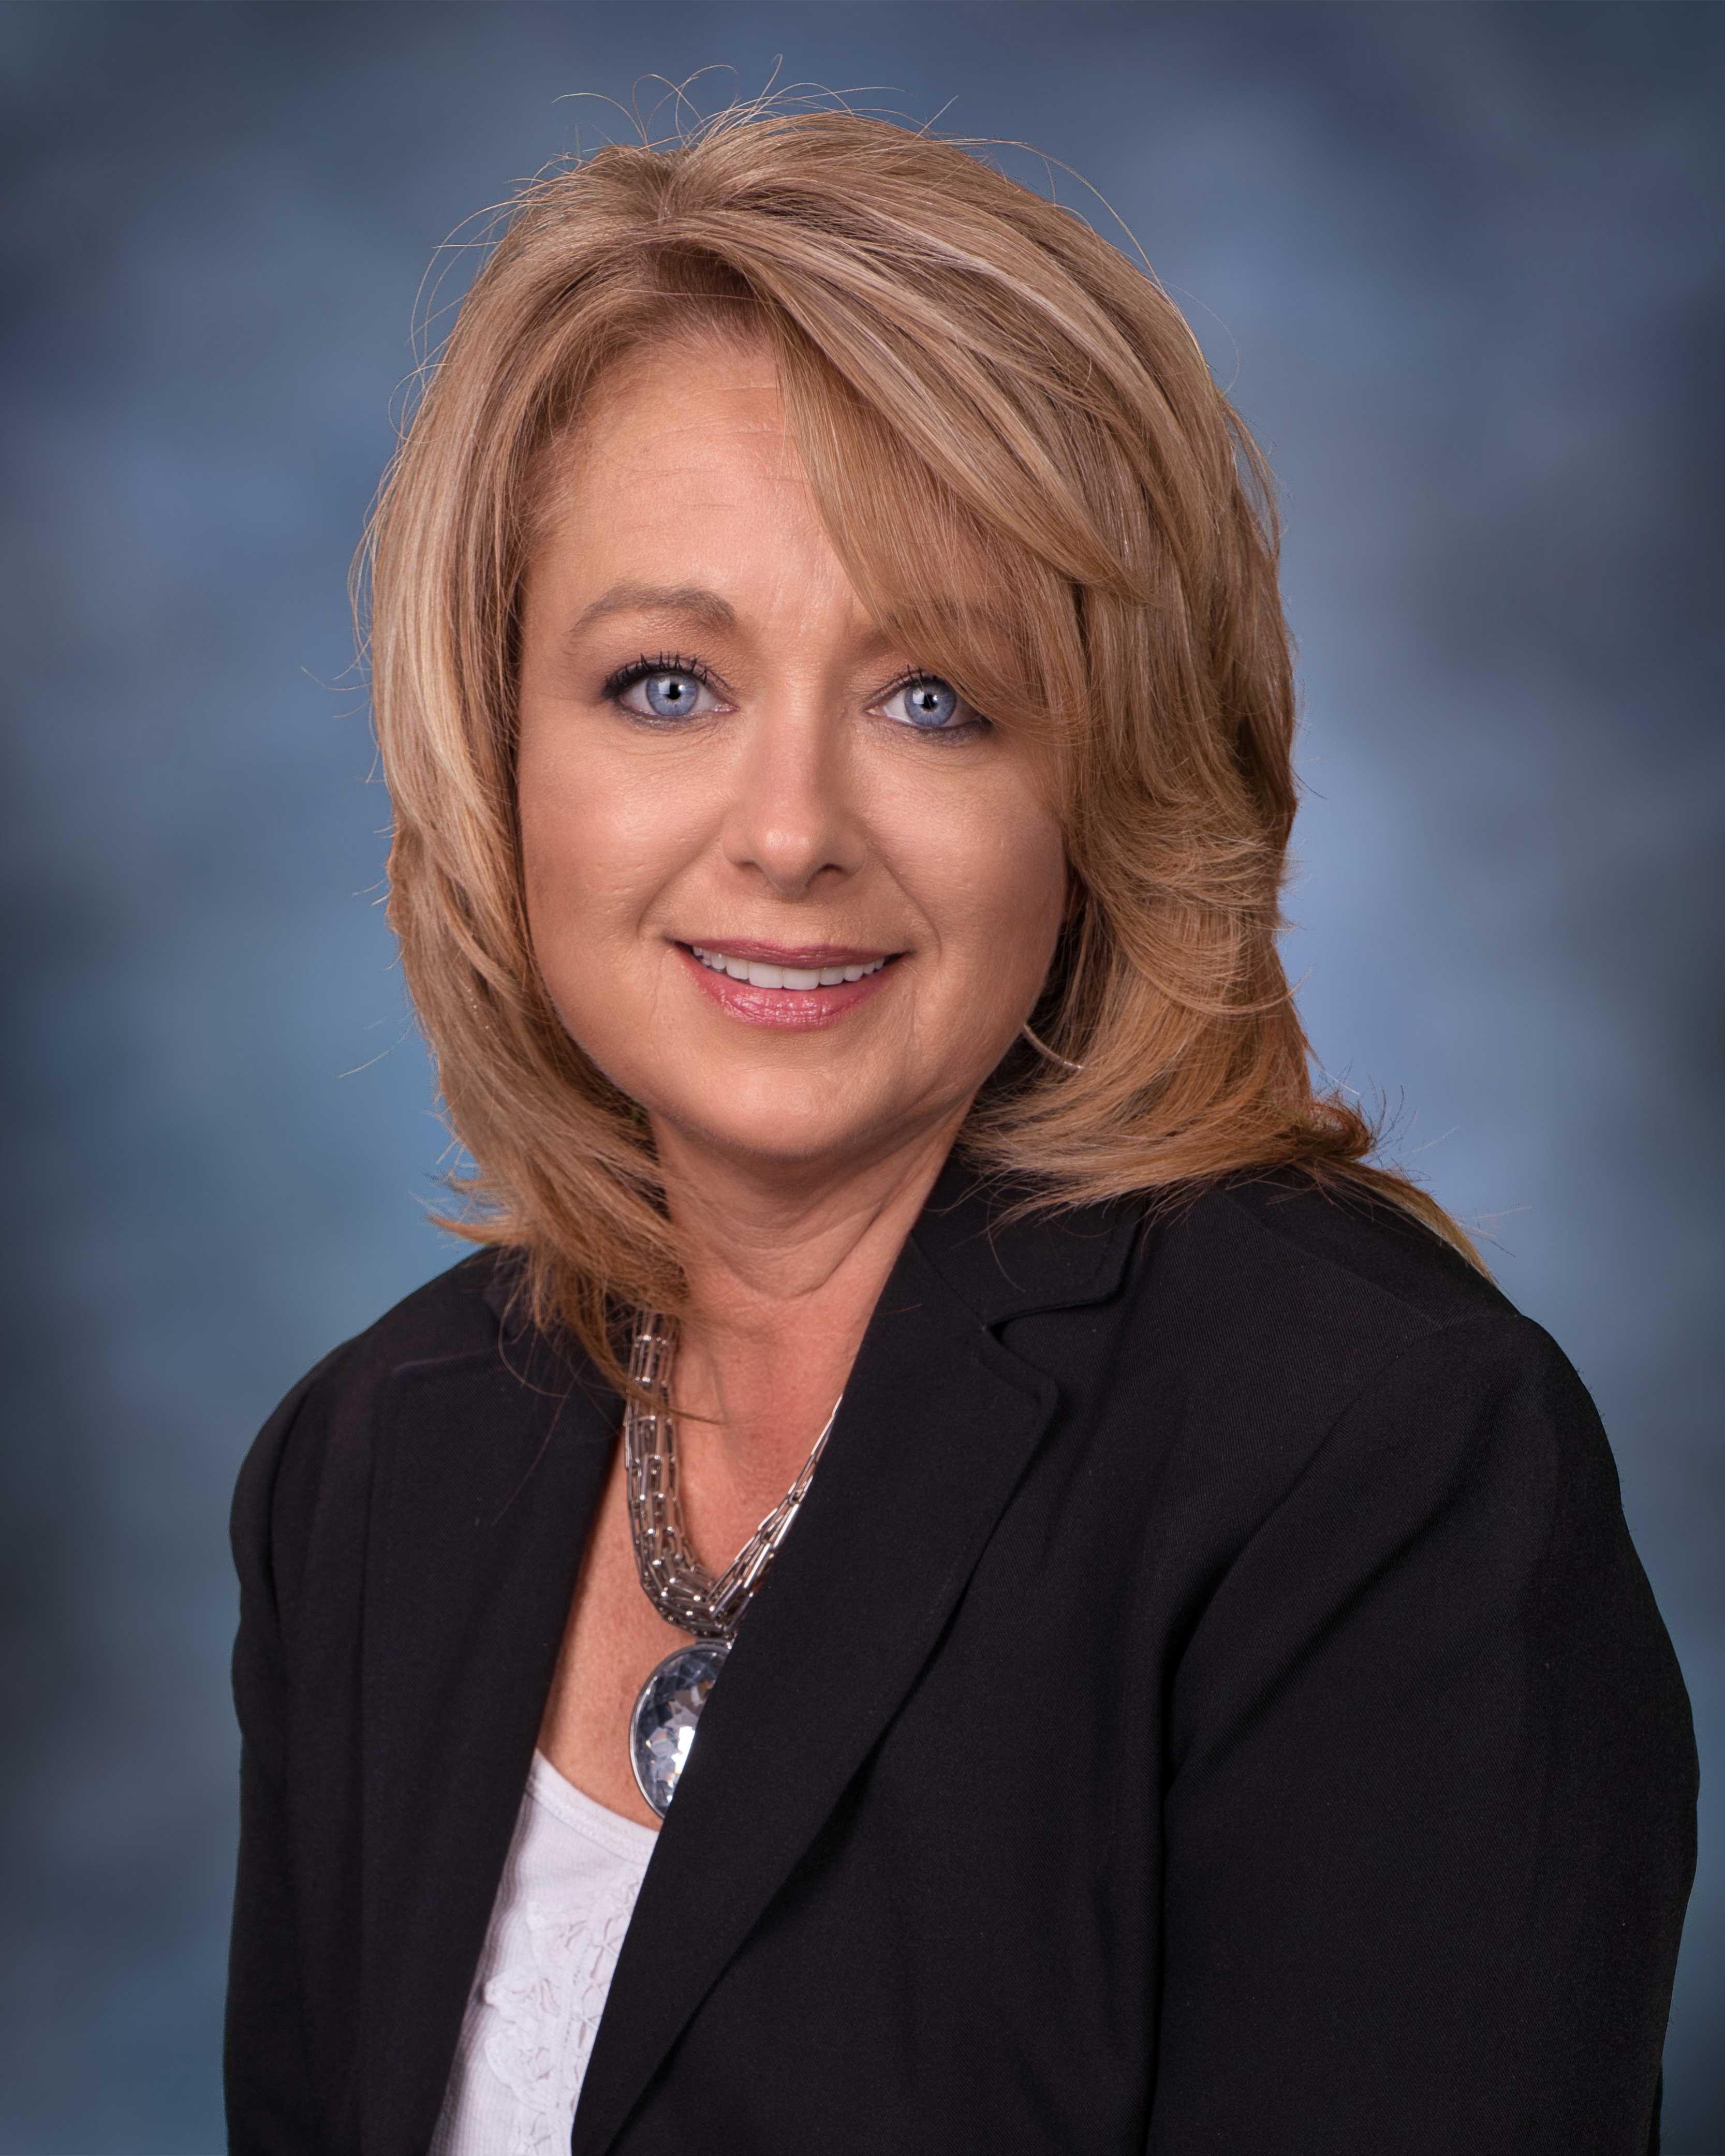 Cynthia D. Houser